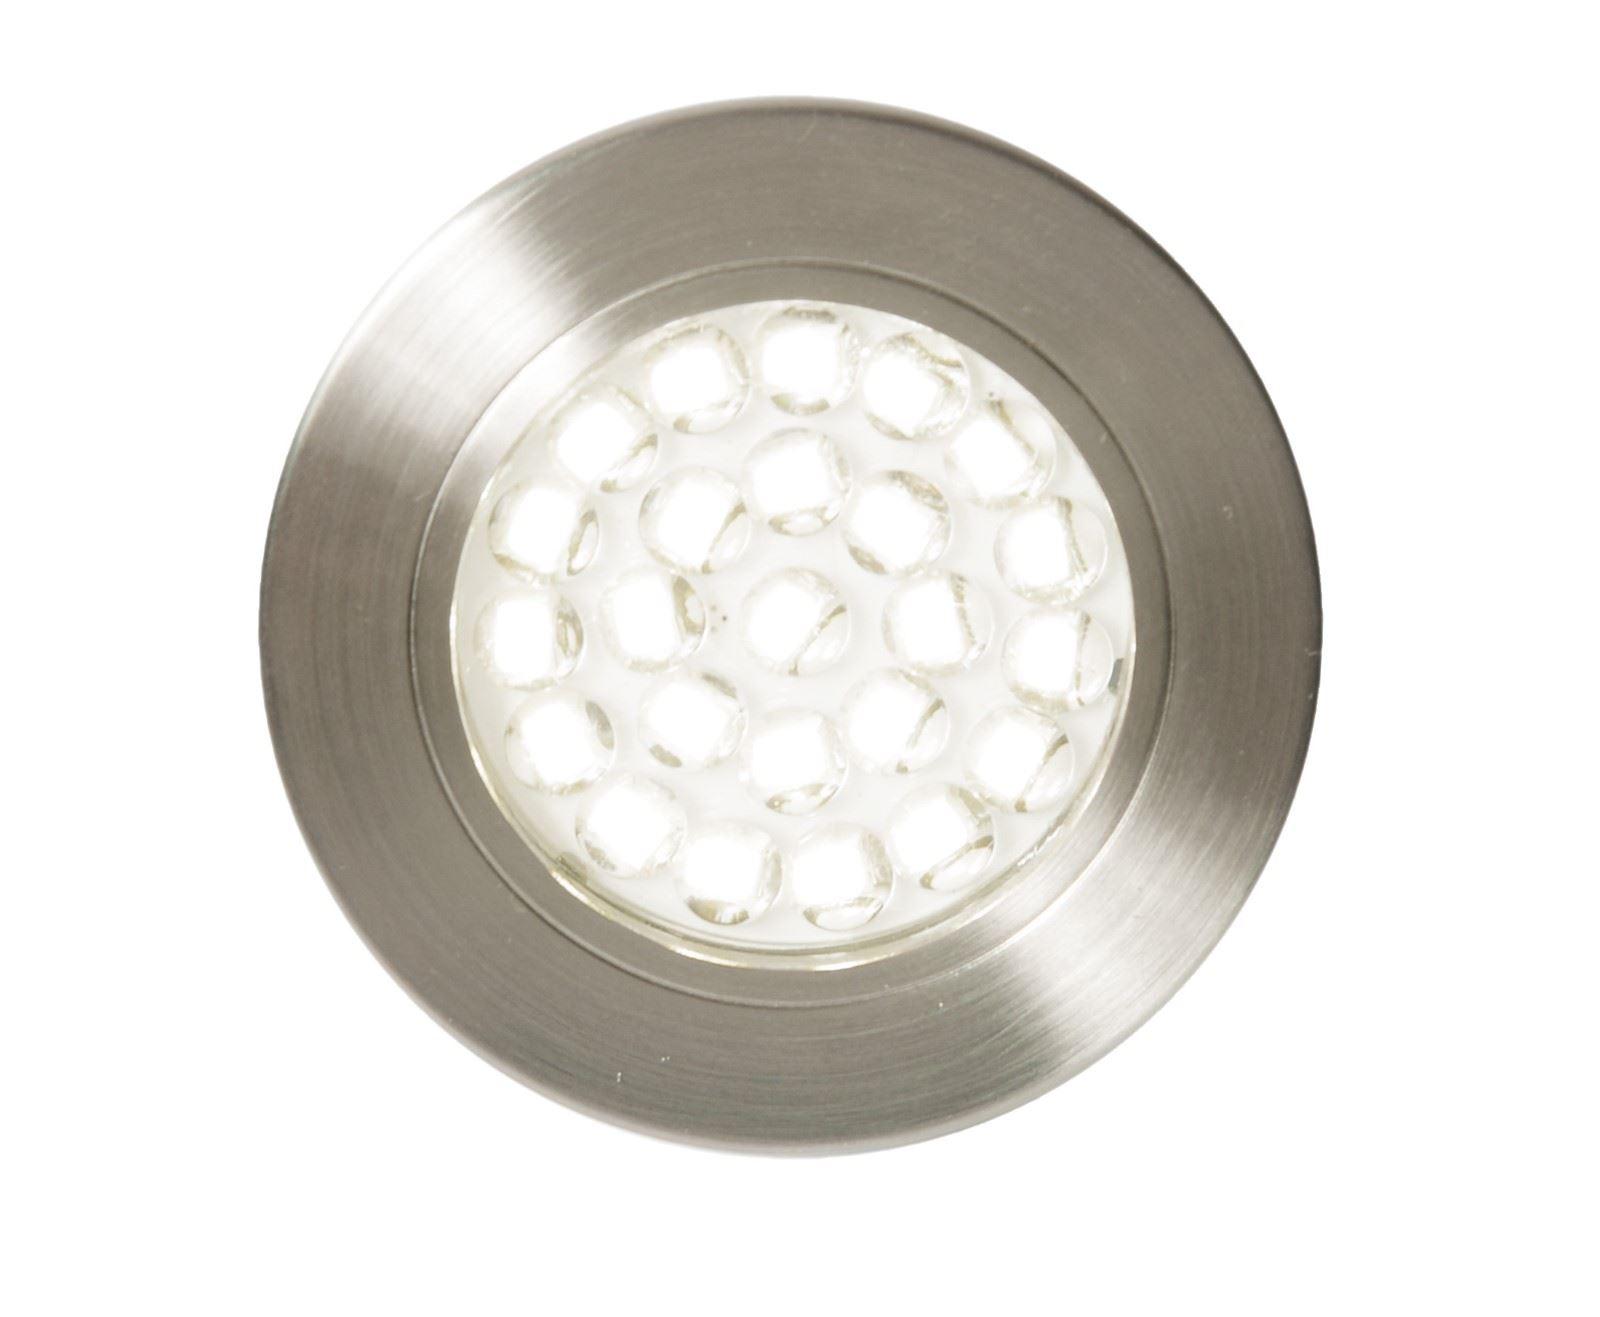 Pozza Led, Mains Voltage, Circular Cabinet Light, 4000K Cool White